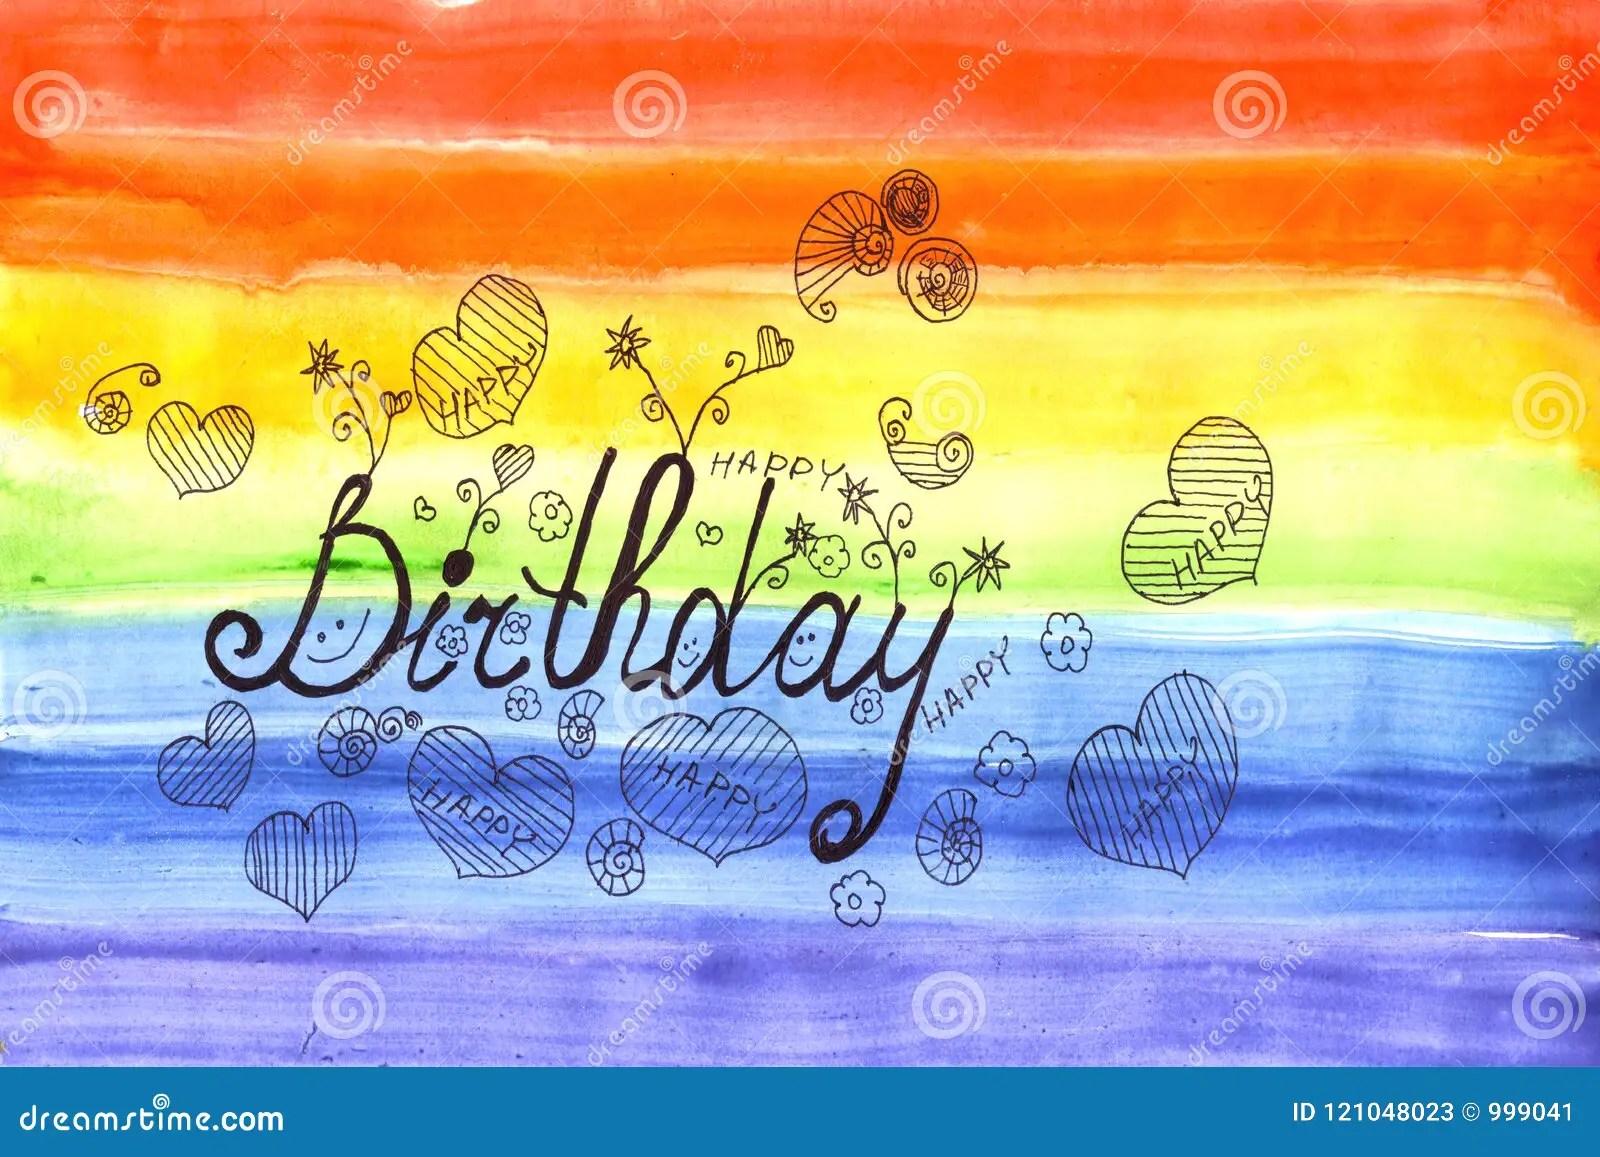 Happy Birthday Watercolor Rainbow Card Illustration Stock Illustration Illustration Of Design Card 121048023